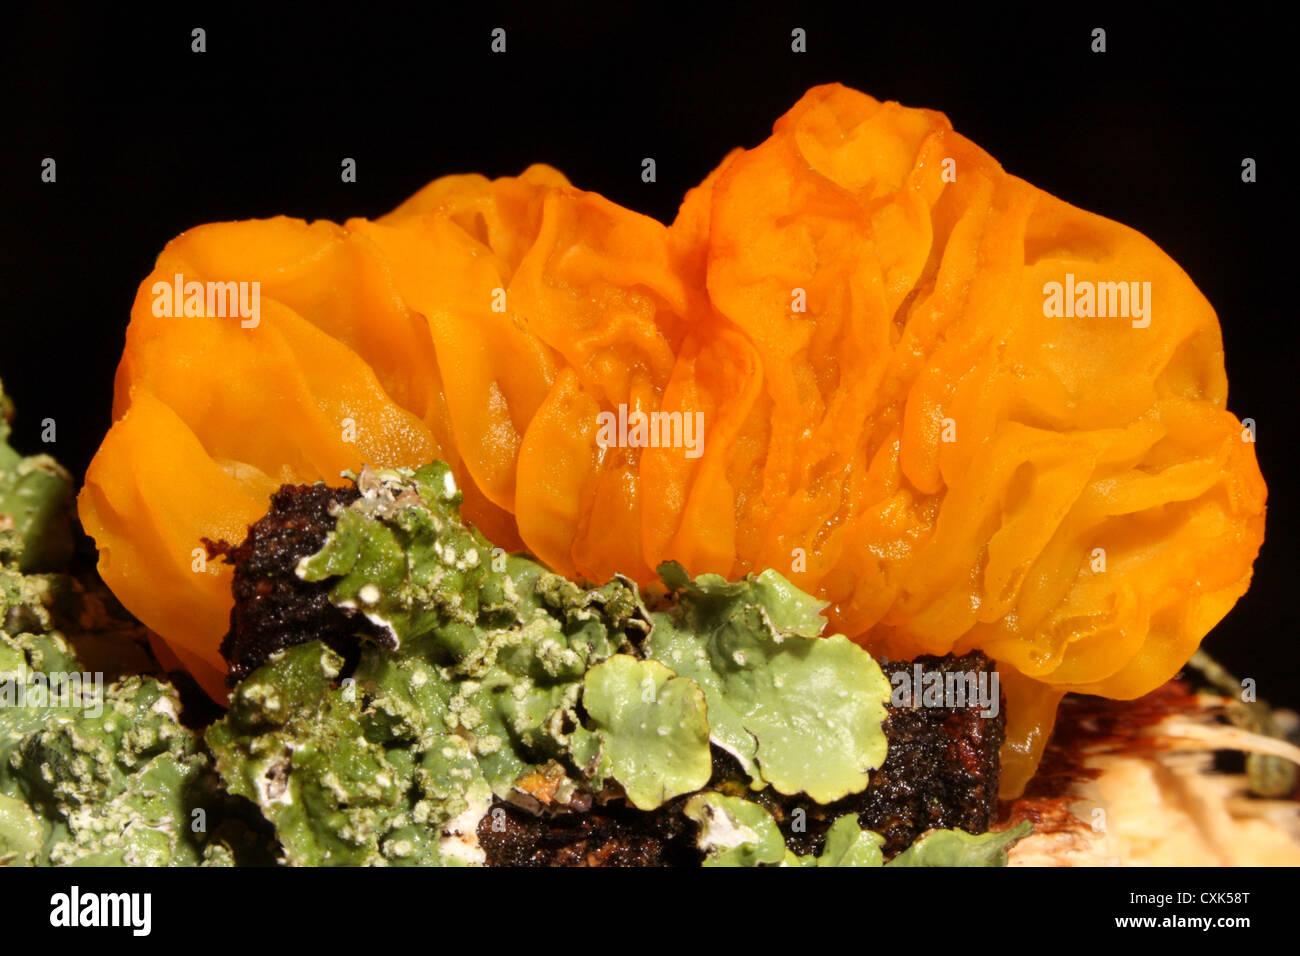 Yellow Brain fungus - Tremella mesenterica - on an oak branch with lichen - Stock Image